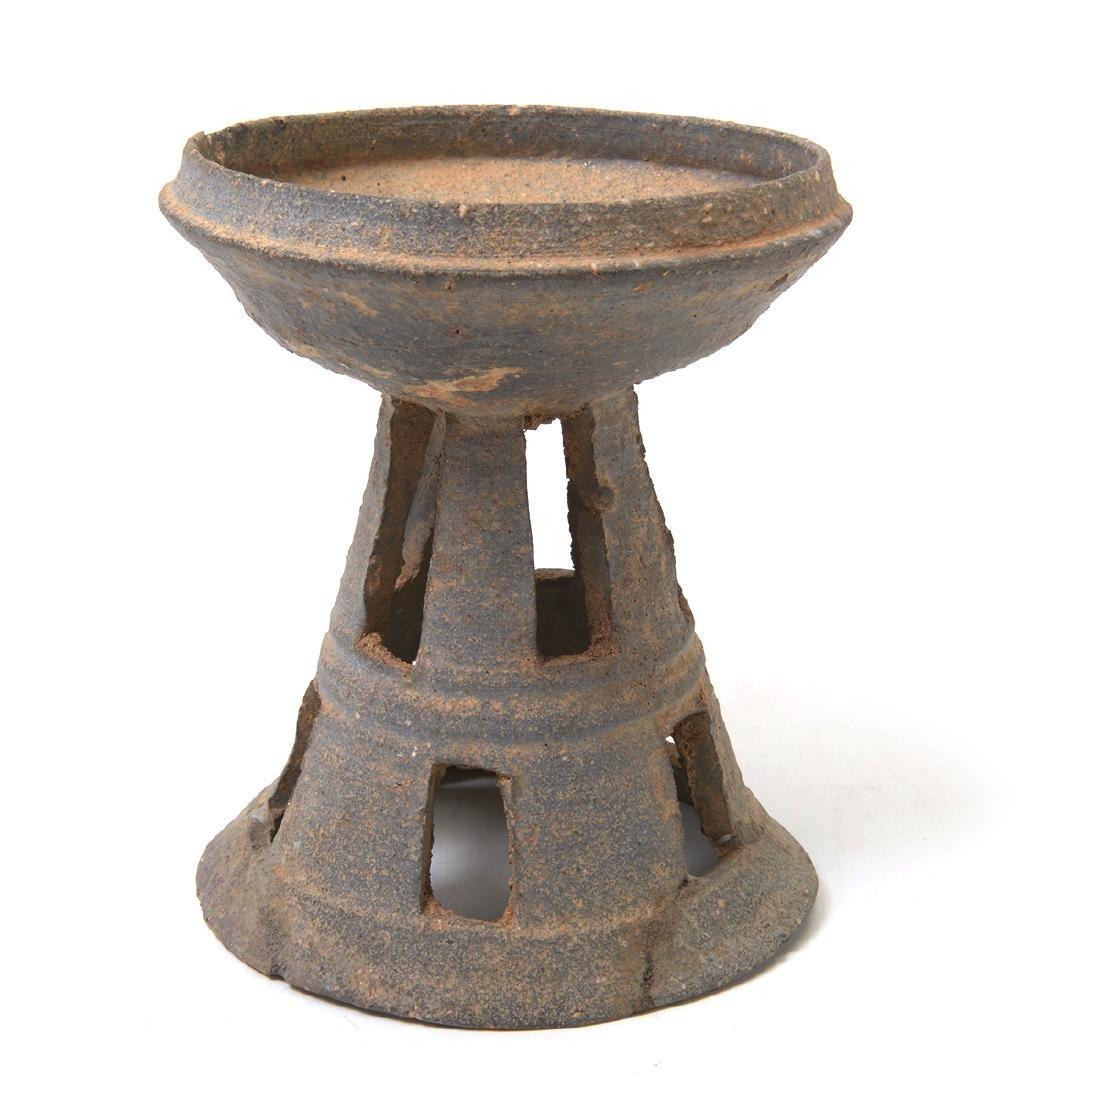 Two Korean Ceramic Stands, Silia Dynasty - 3